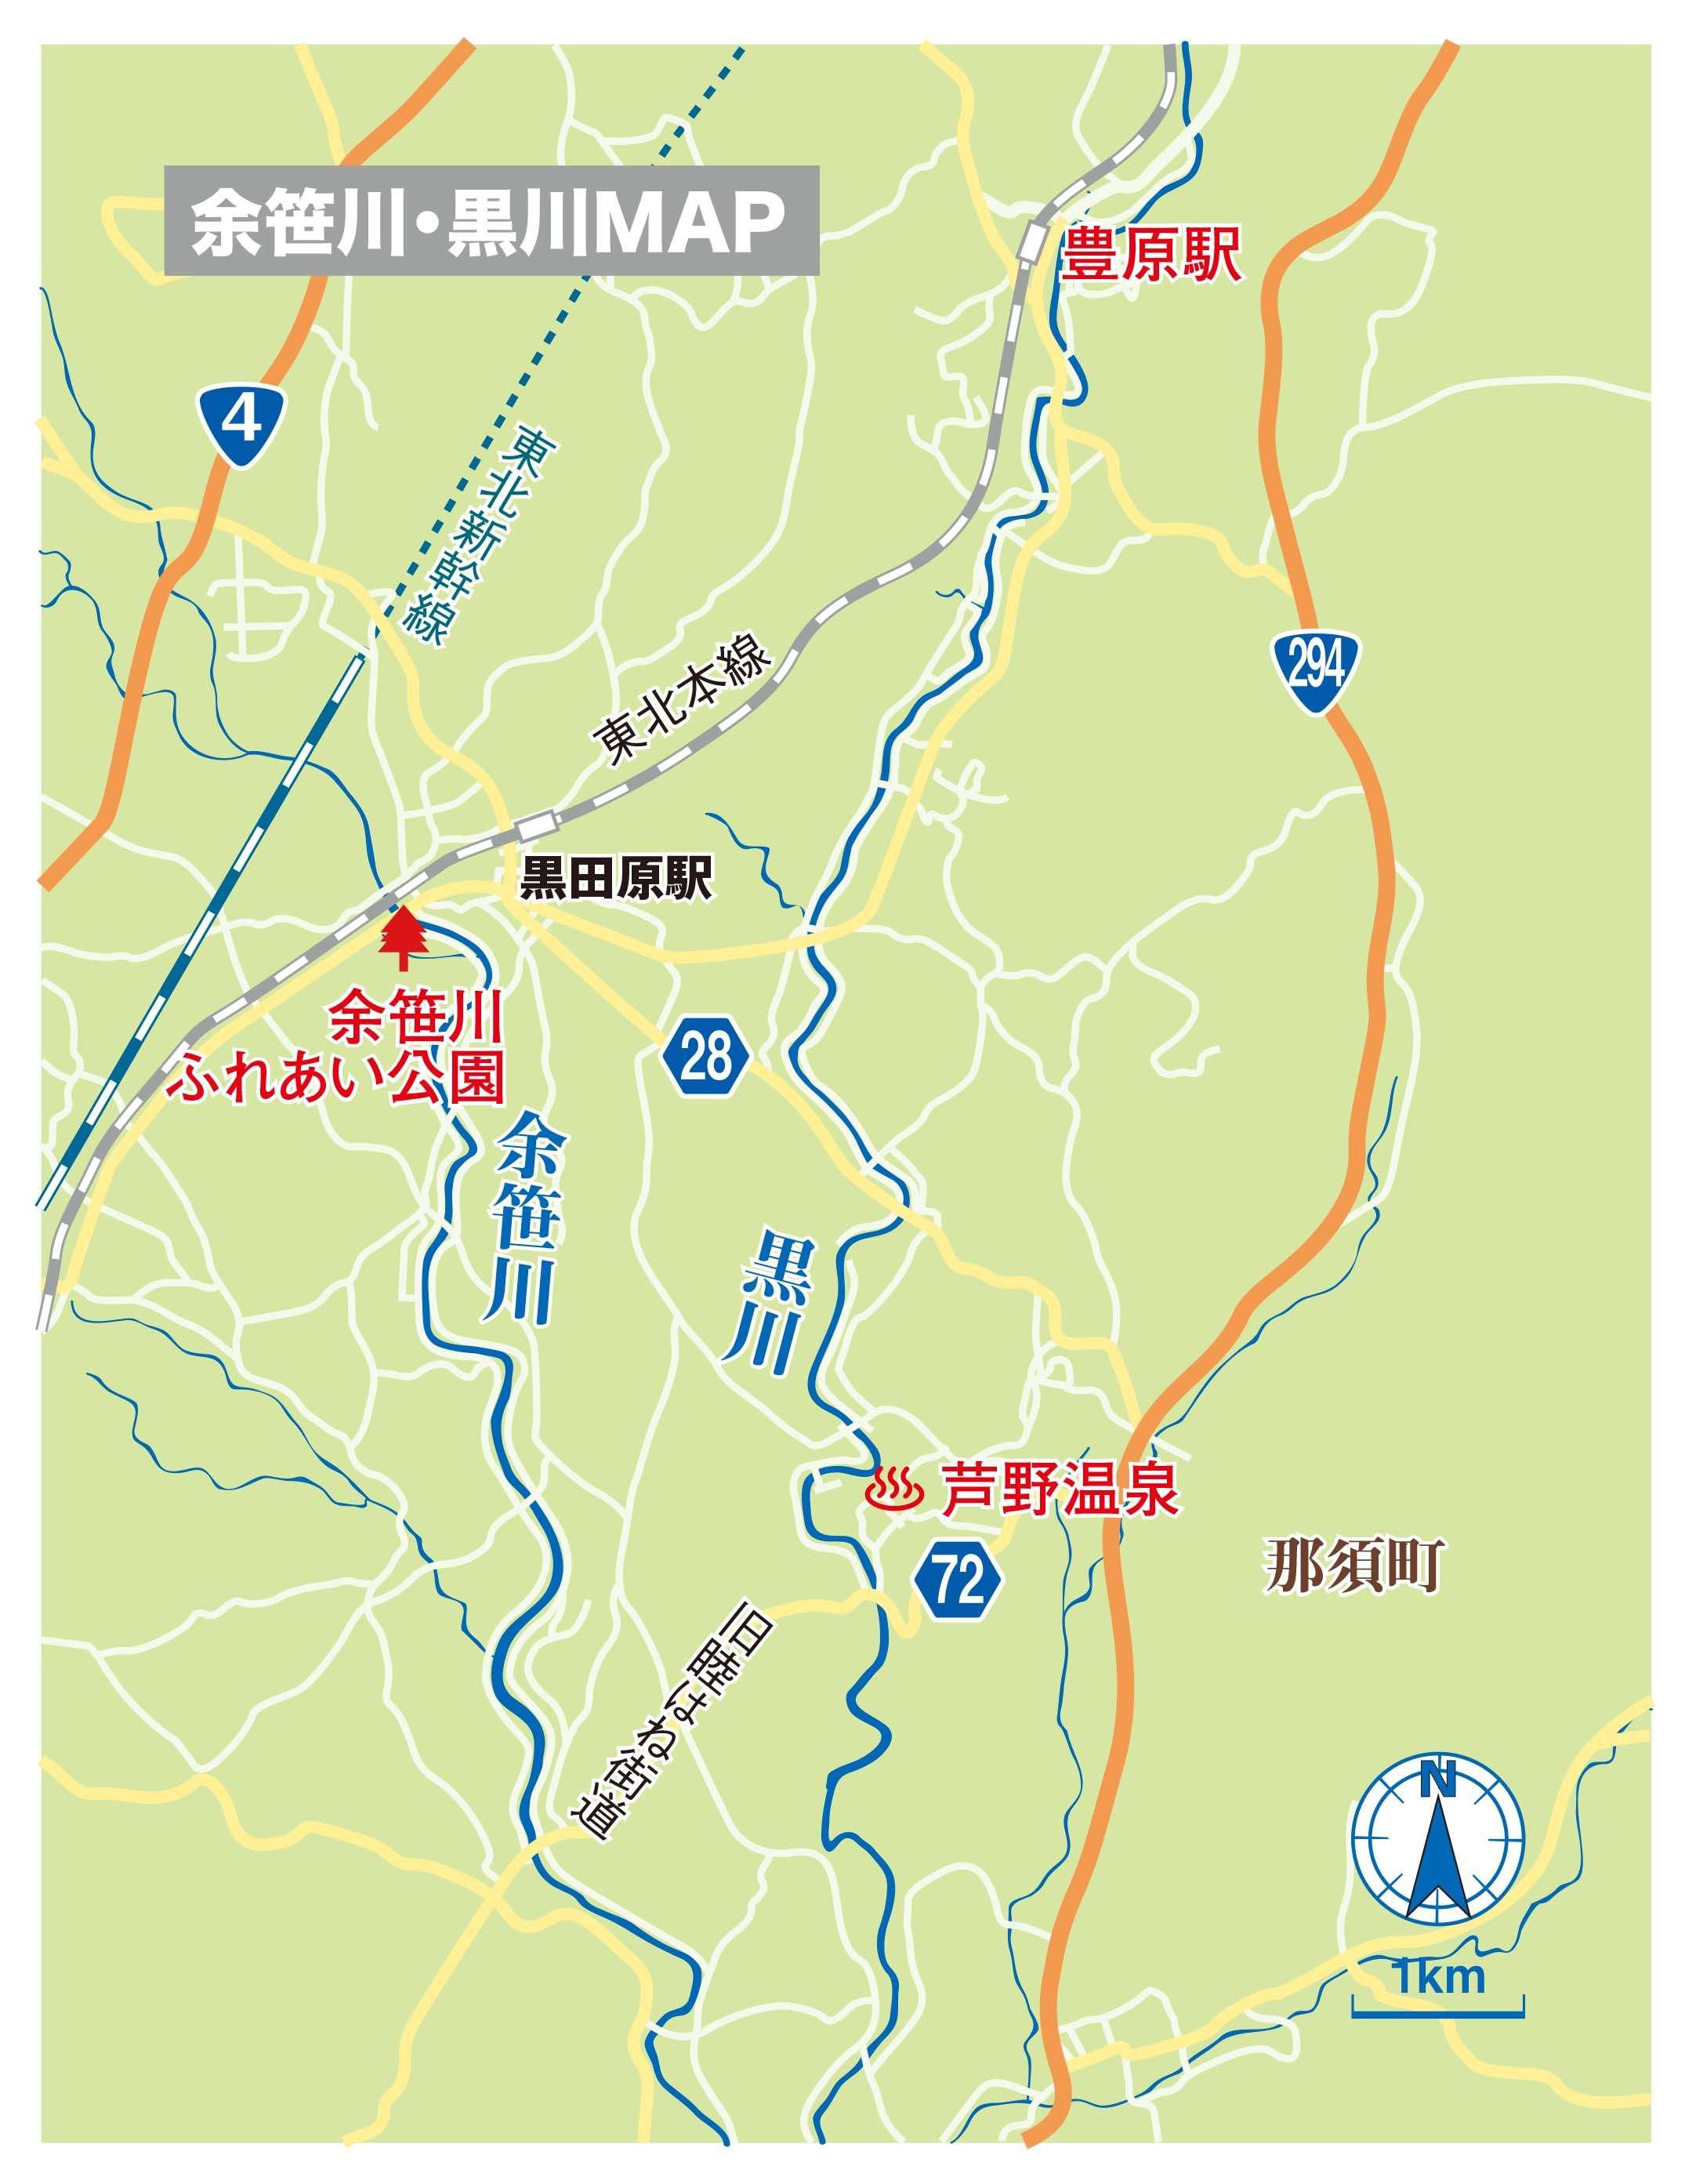 028-036dantou-keiryu_cs6 (12)